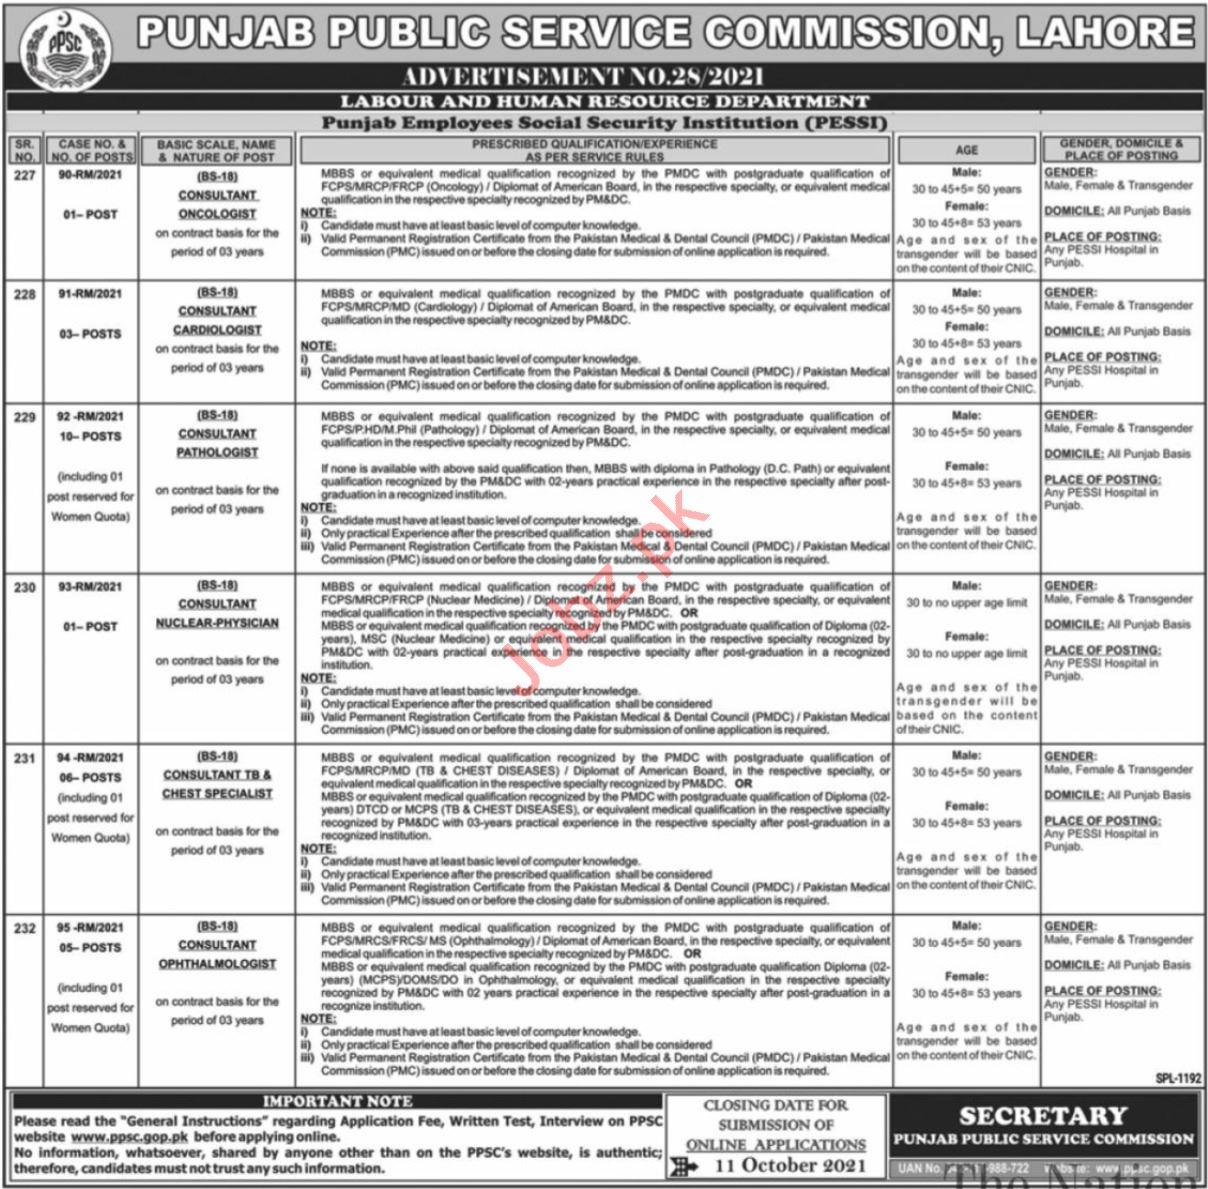 Punjab Employees Social Security Institution PESSI Jobs 2021